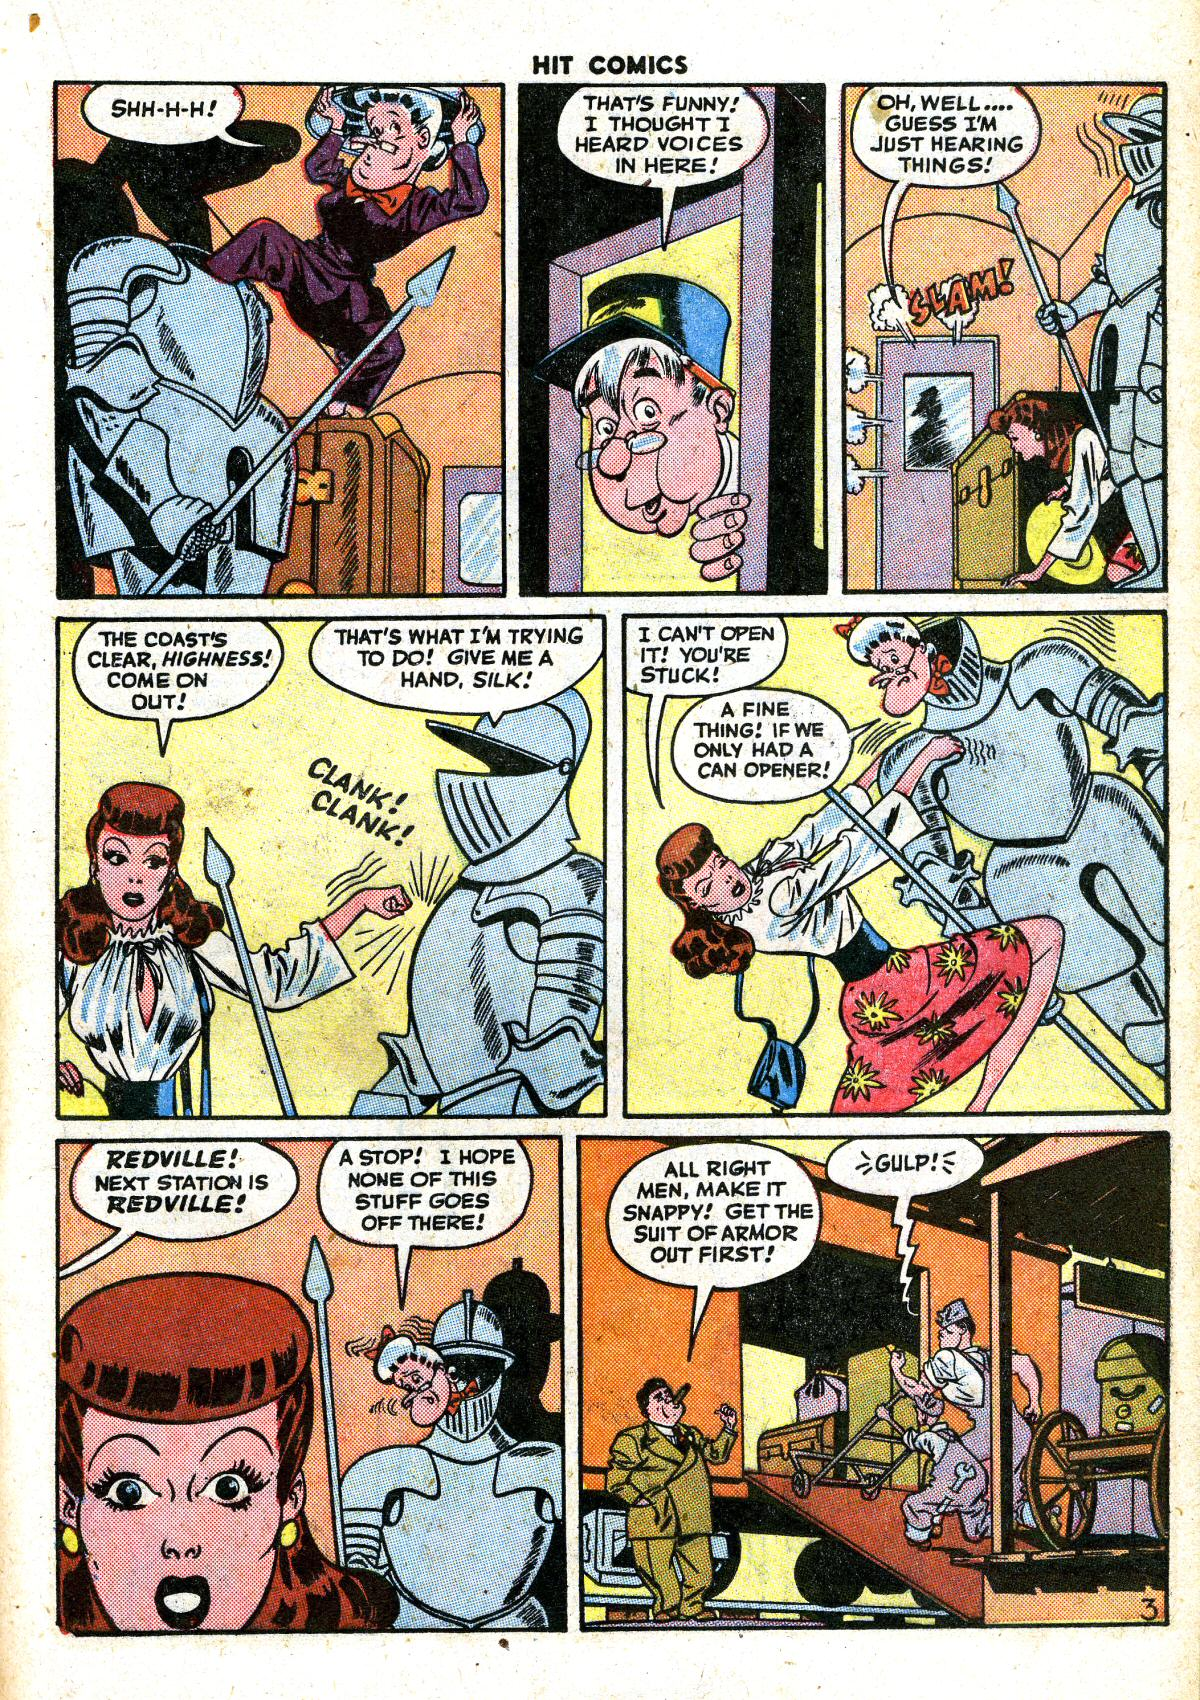 Read online Hit Comics comic -  Issue #41 - 27